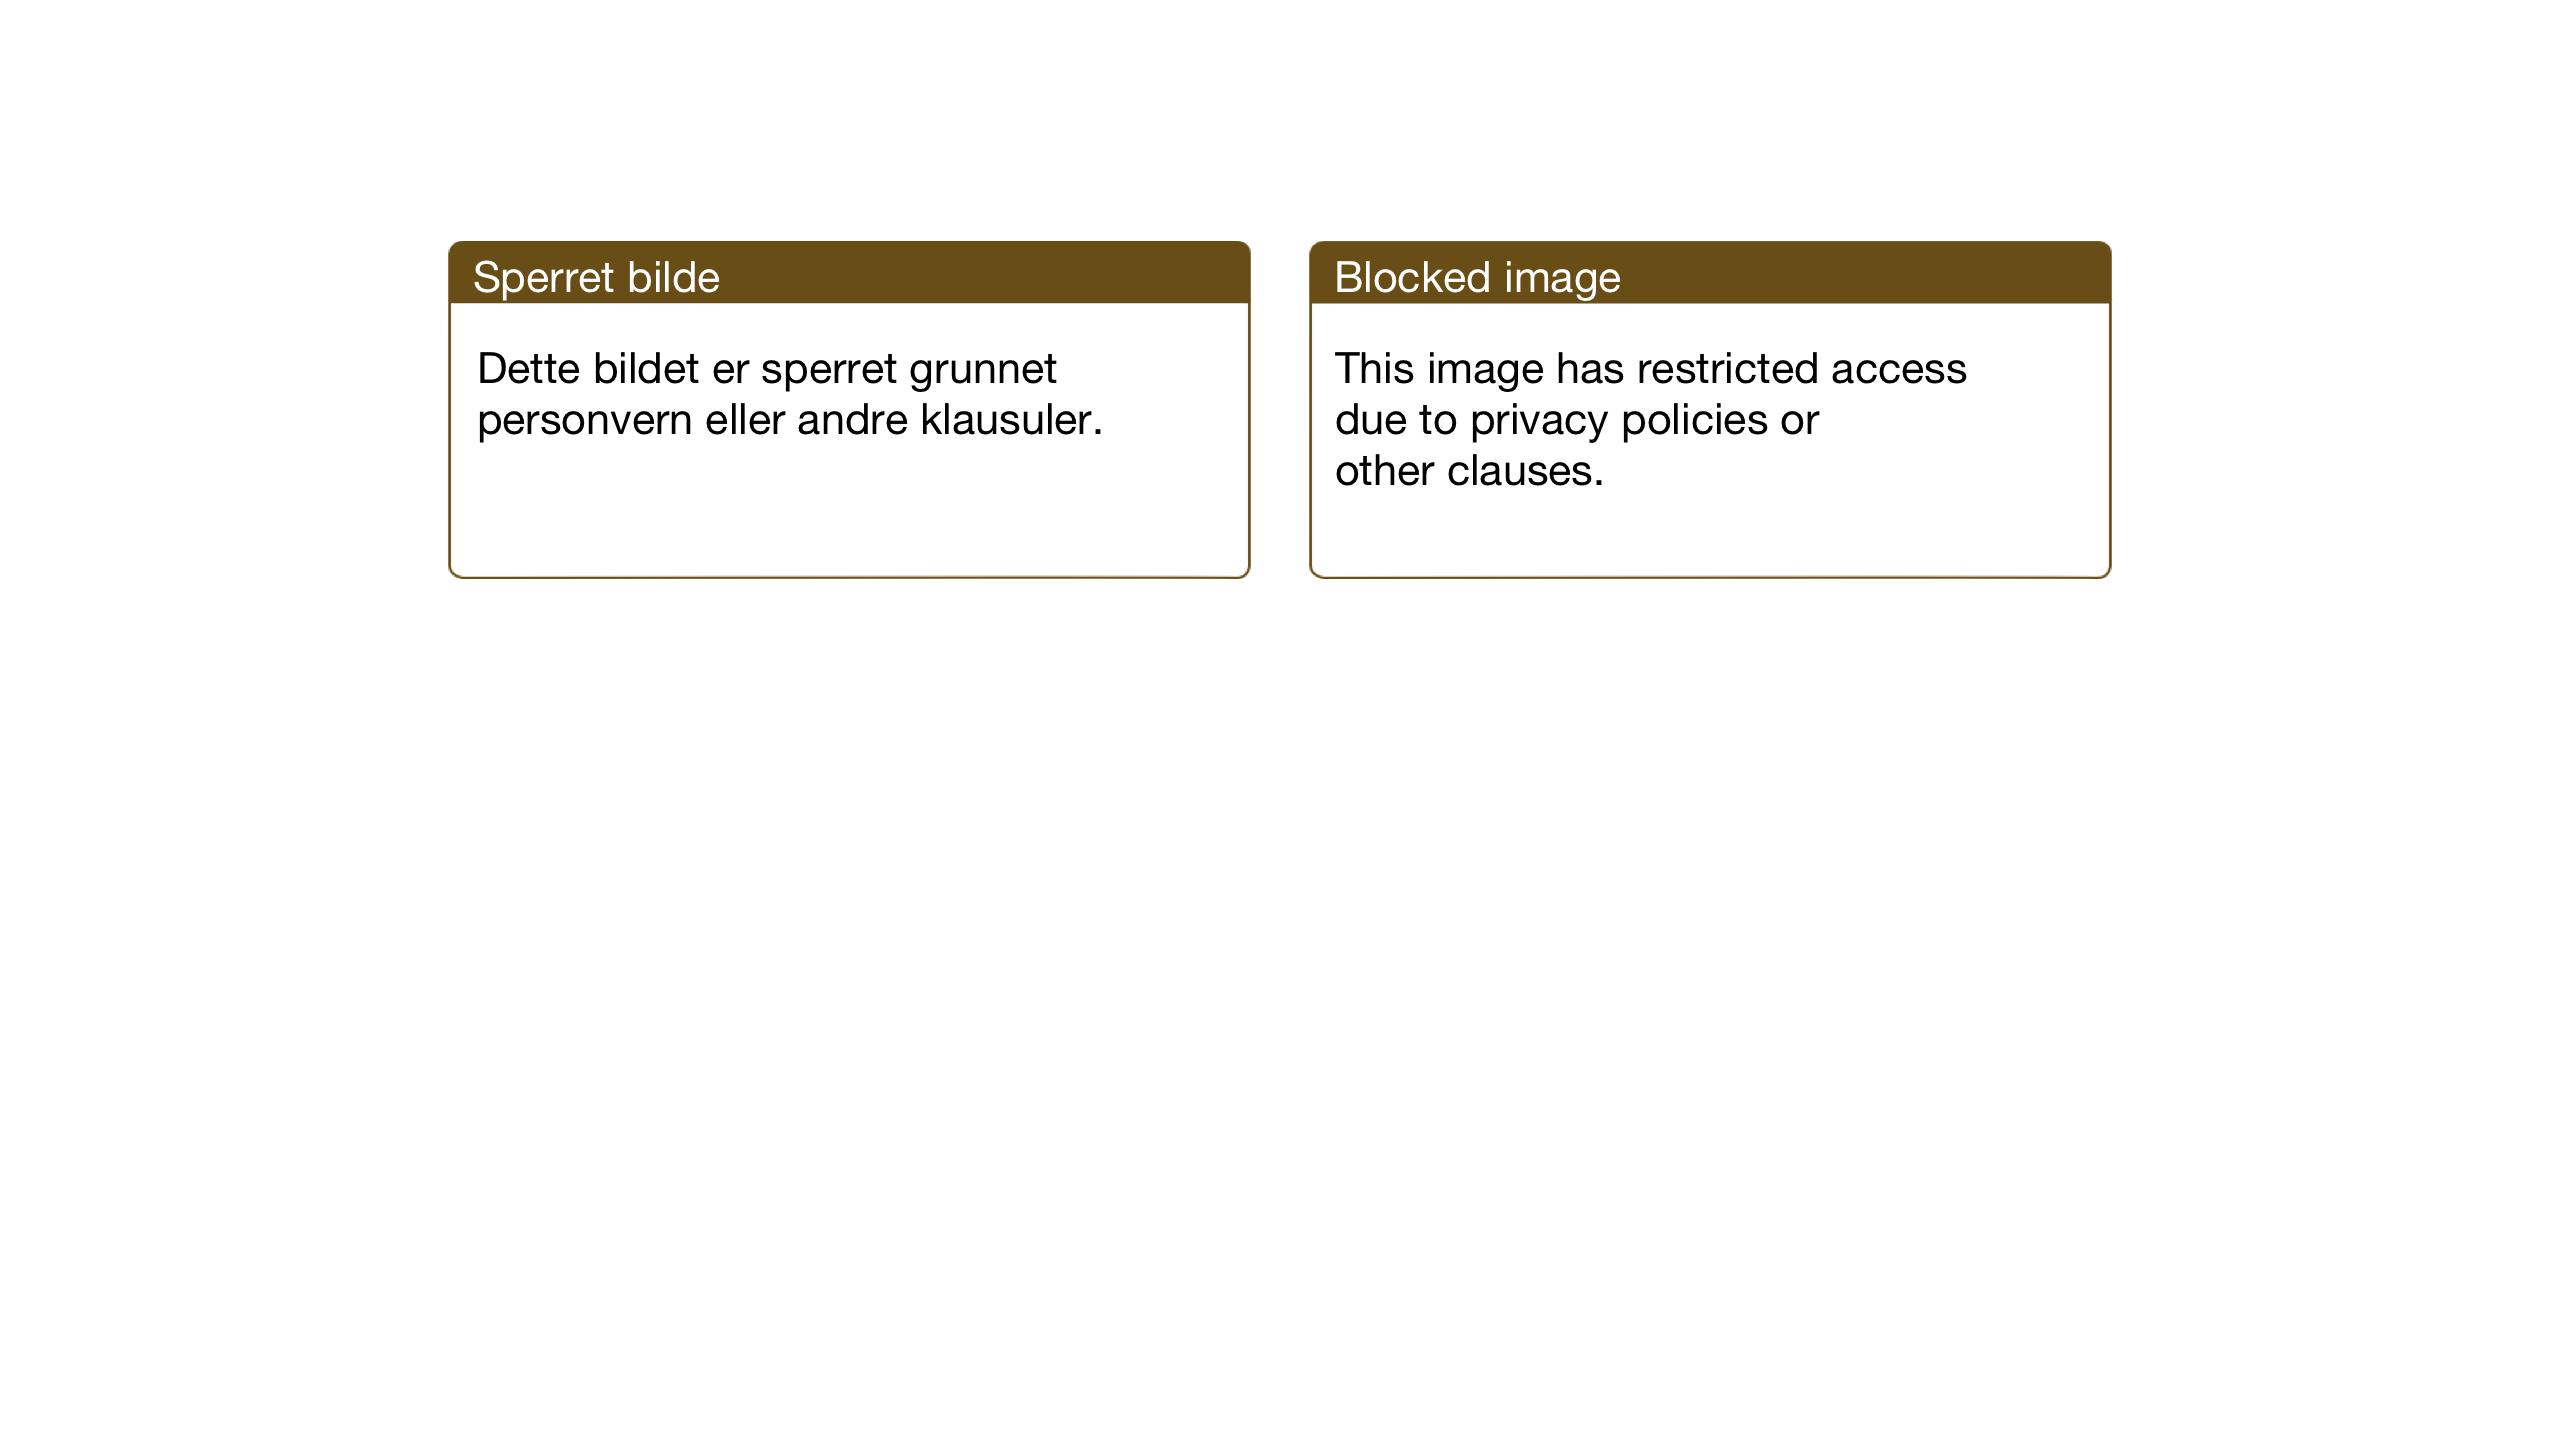 SAT, Ministerialprotokoller, klokkerbøker og fødselsregistre - Nordland, 847/L0680: Klokkerbok nr. 847C08, 1930-1947, s. 47